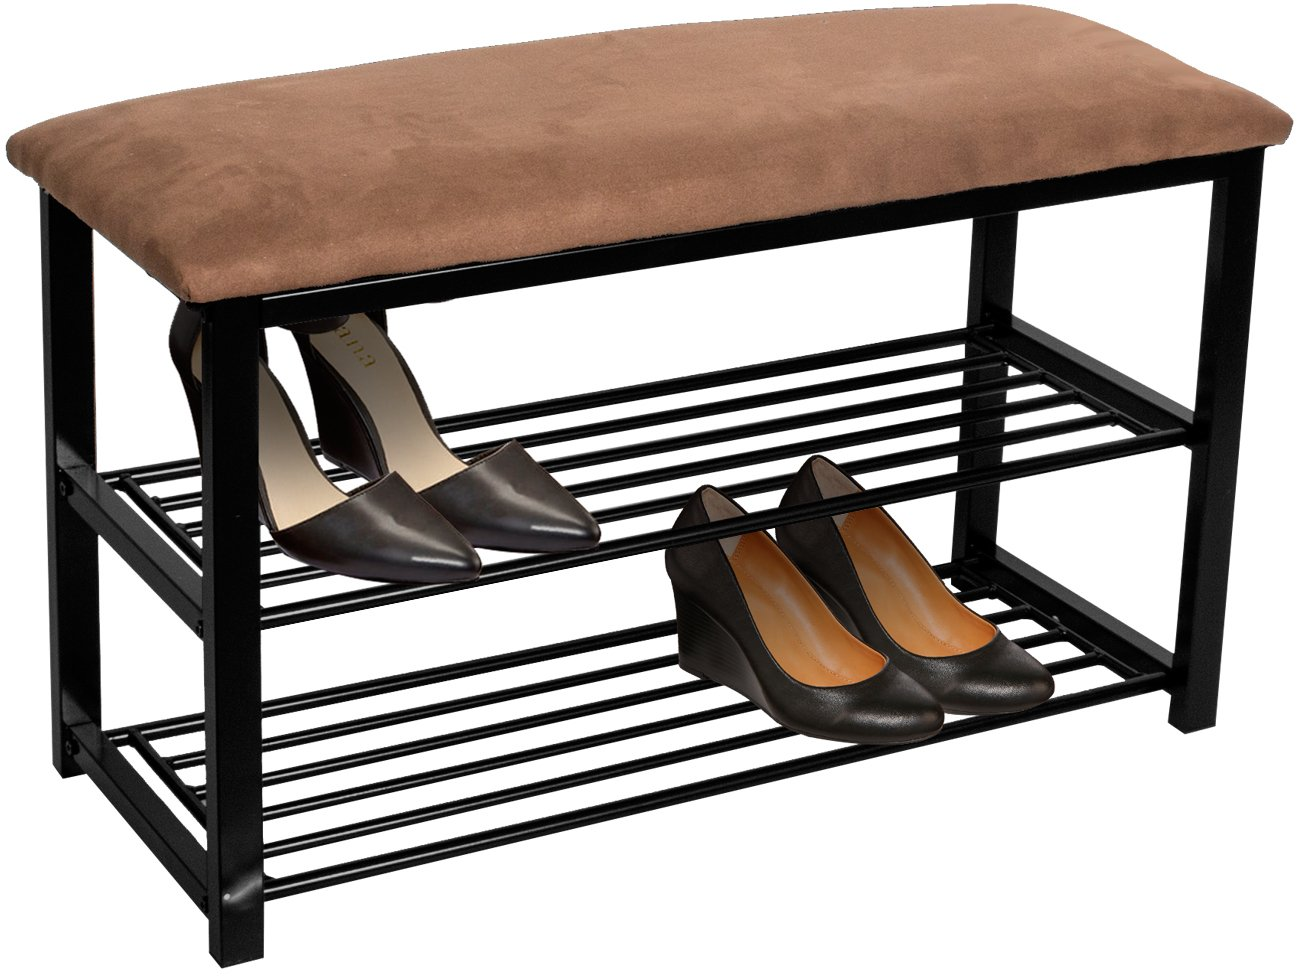 Sorbus Shoe Rack Bench - Shoes Racks Organizer - Perfect Bench Seat Storage Hallway Entryway, Mudroom, Closet, Bedroom, etc (Brown) SH-BNCHA